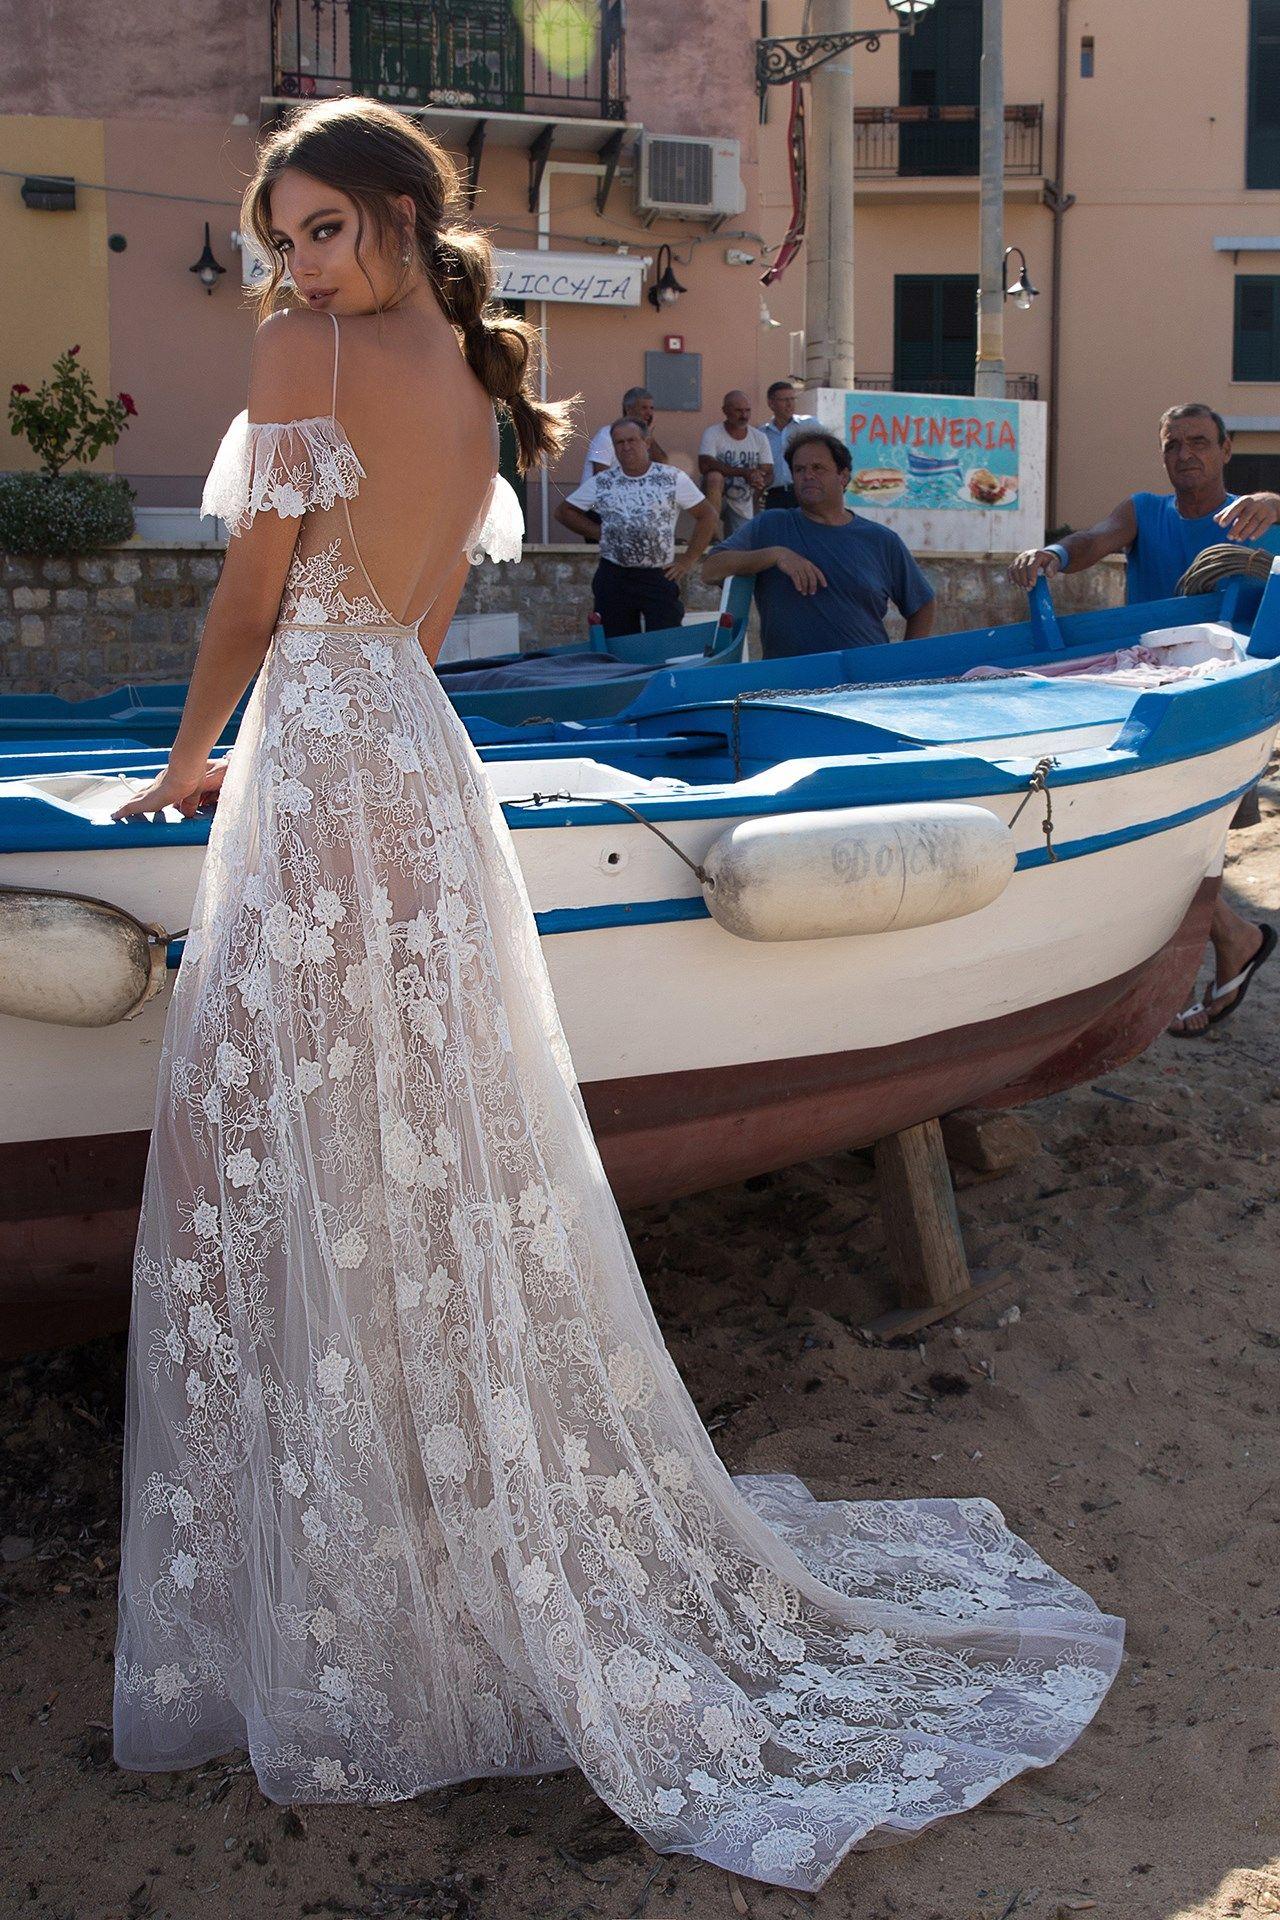 Embroidered Wedding Dresses - Brides Magazine 2018 (BridesMagazine ...